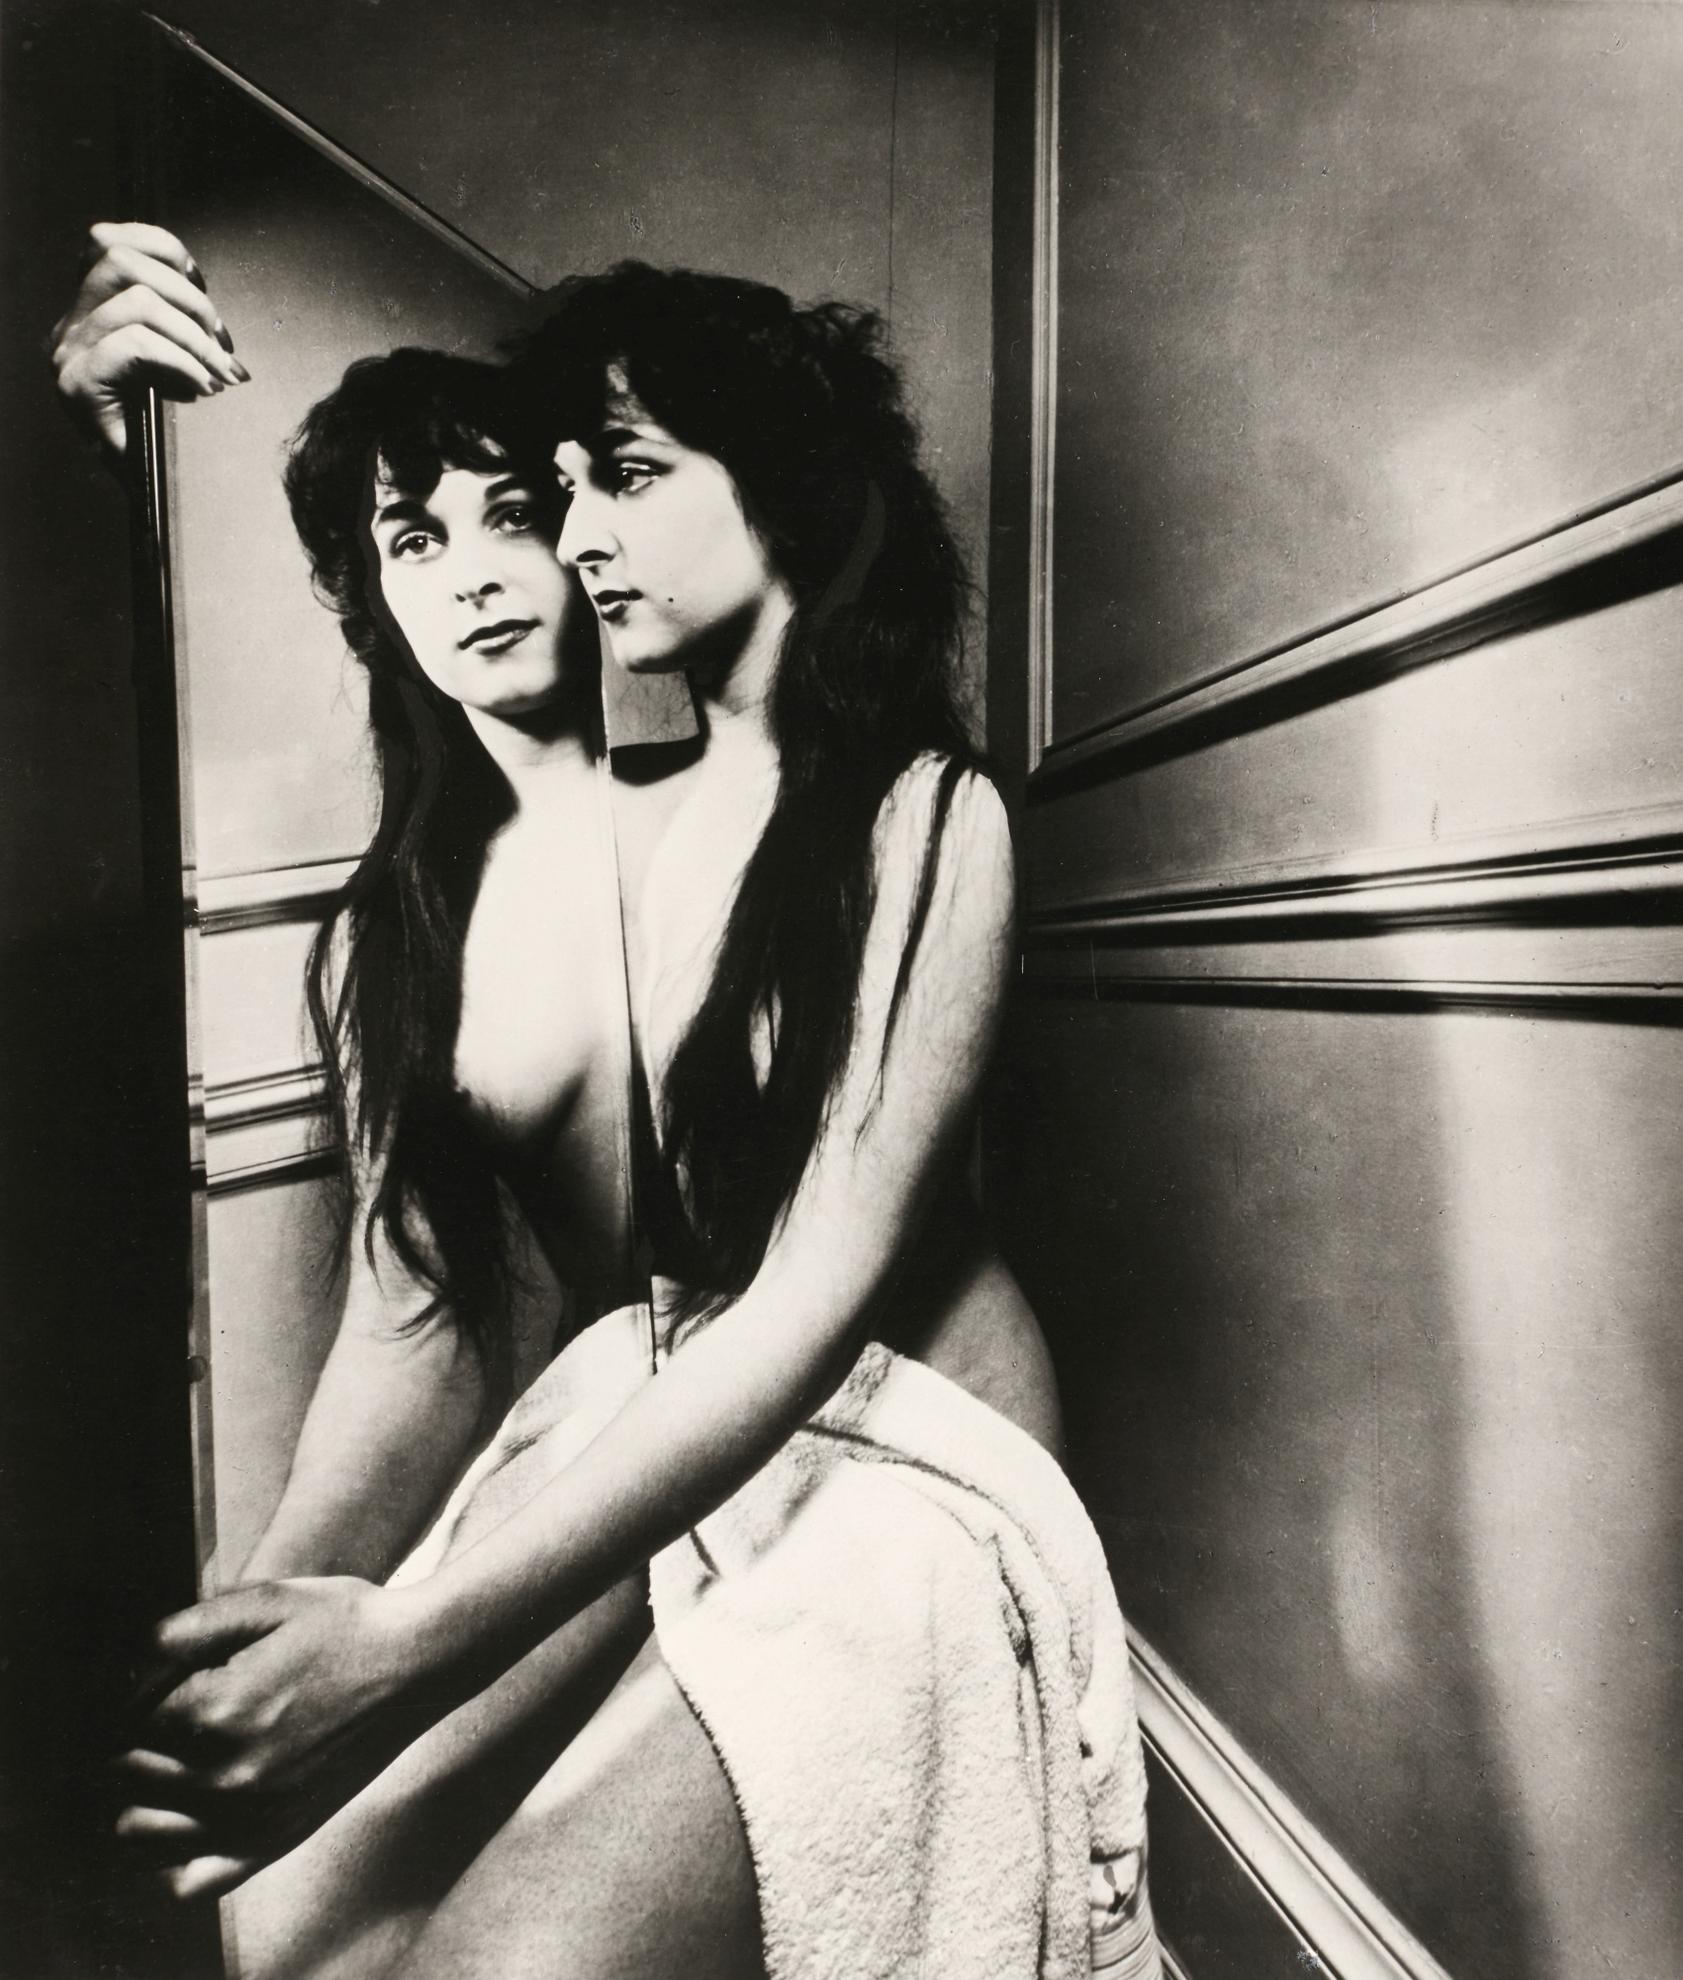 Bill Brandt-Kismet And Mirror, 1953-1953